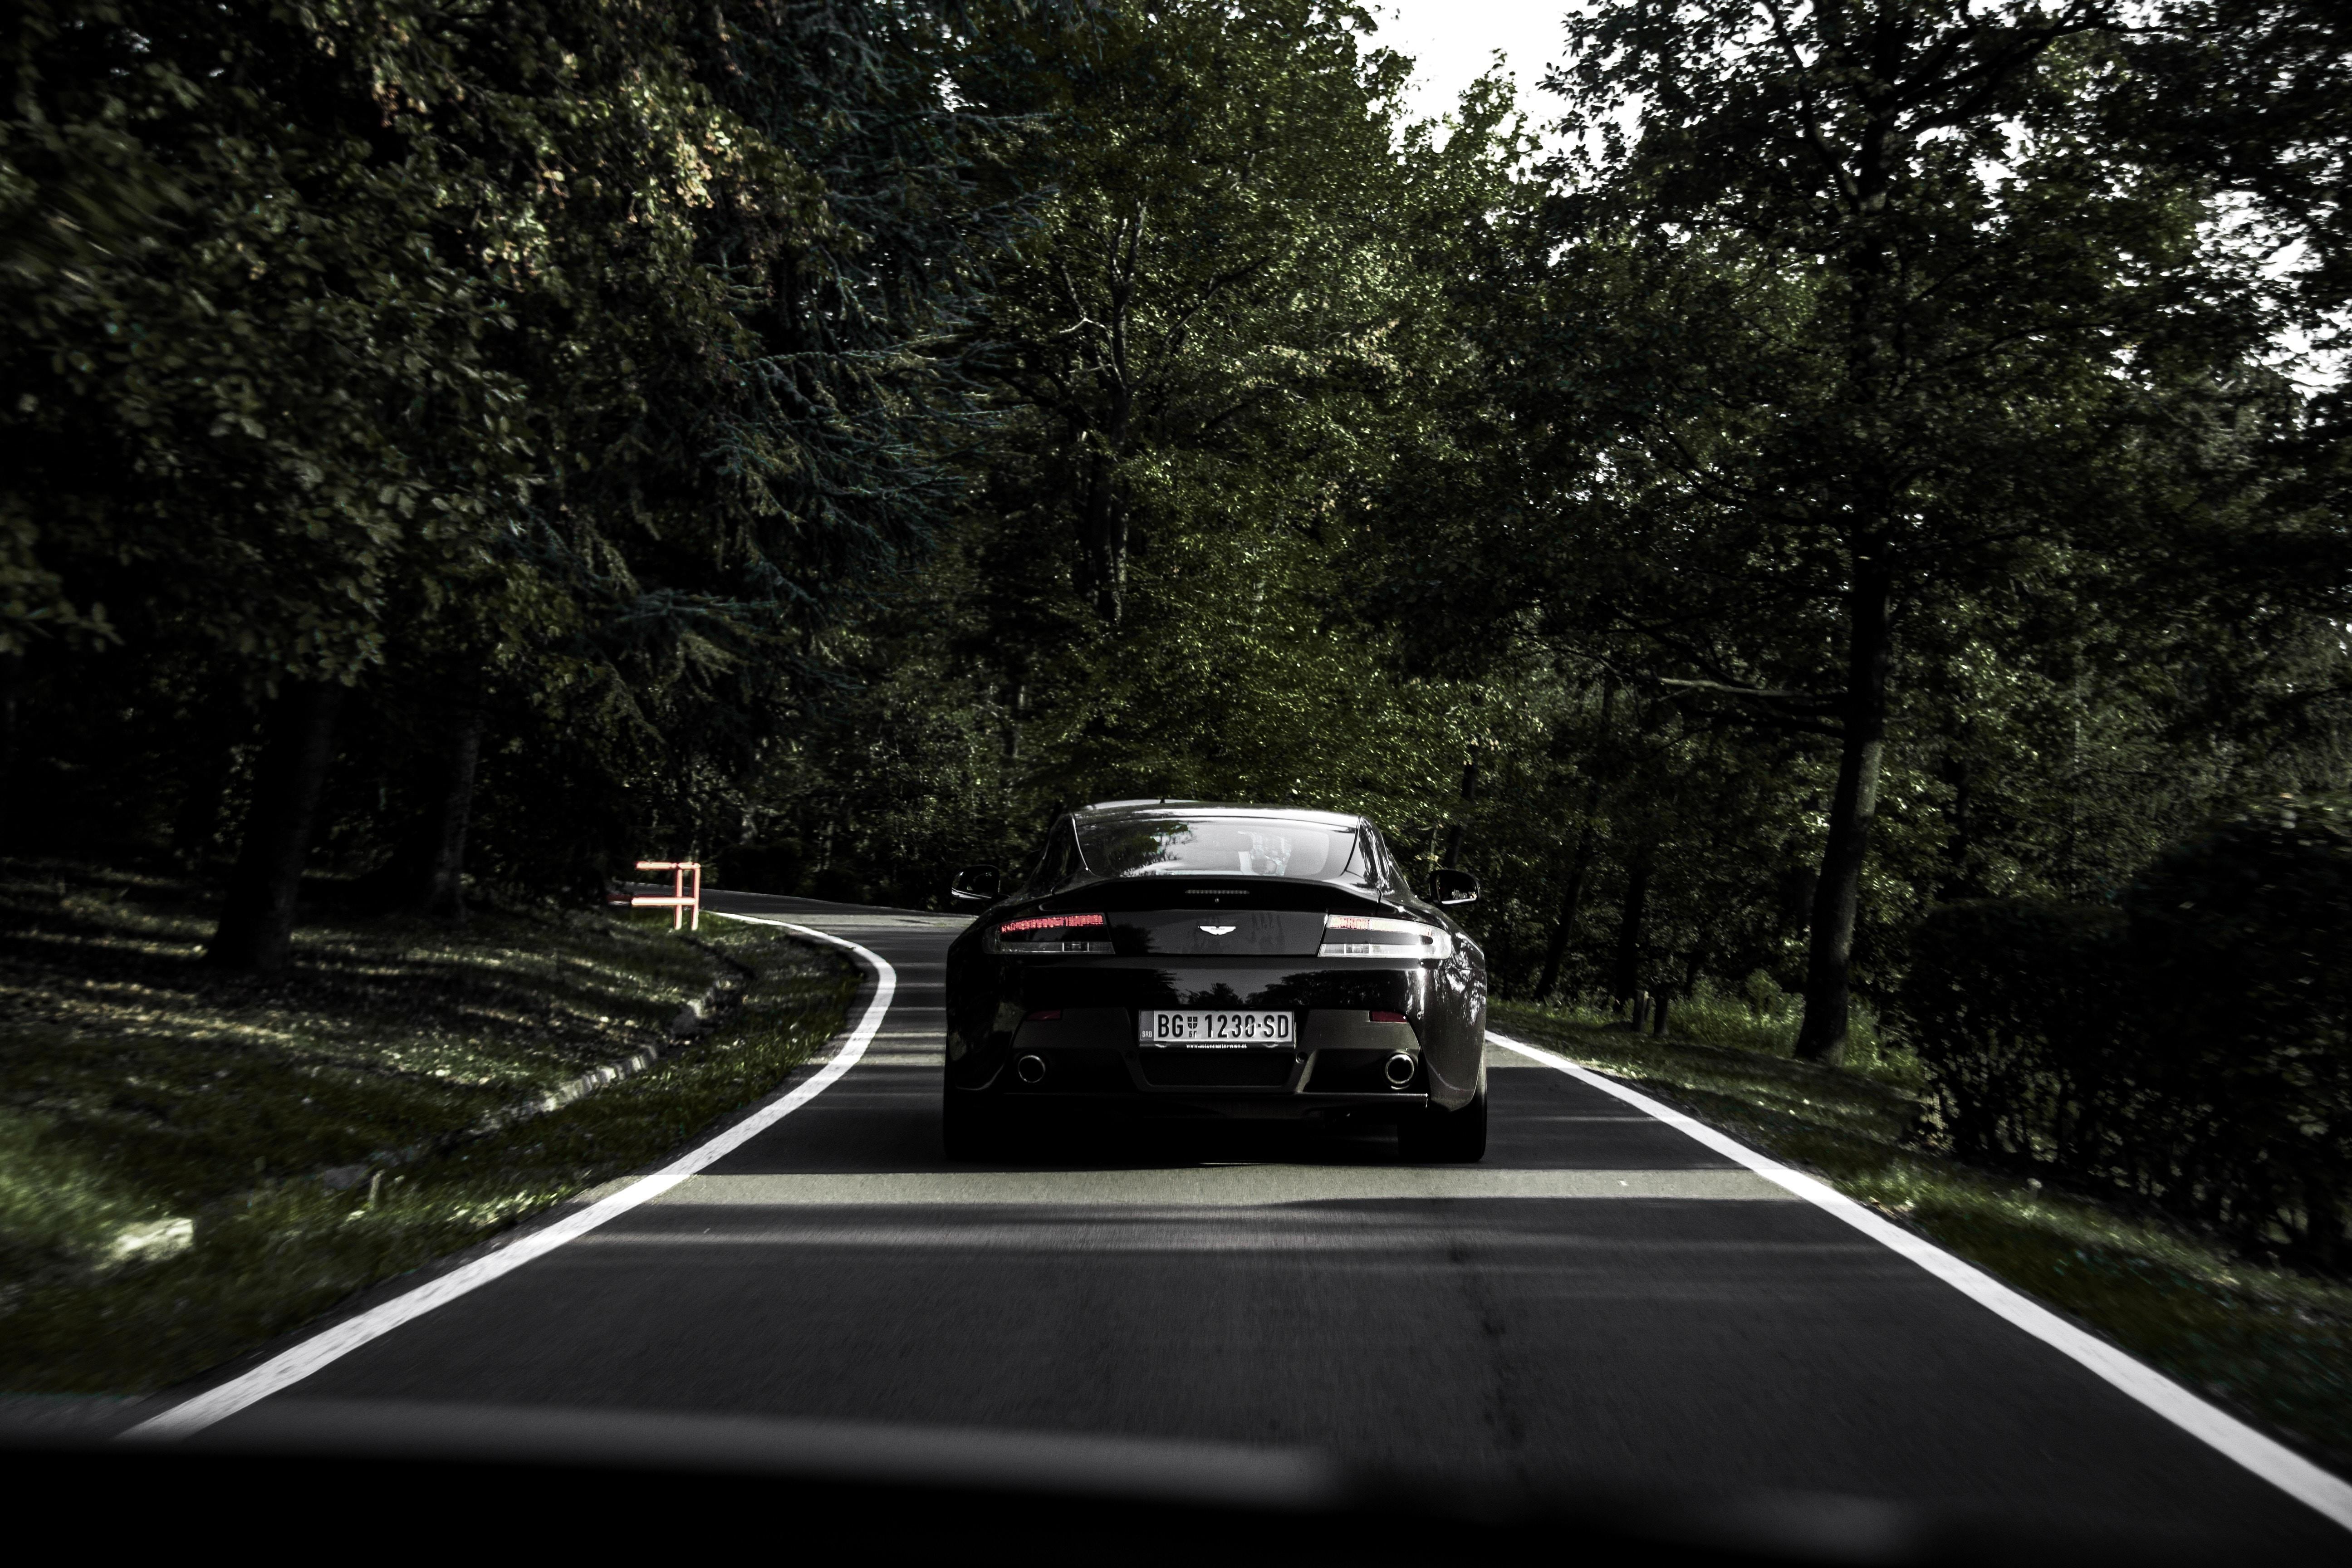 147911 Заставки и Обои Астон Мартин (Aston Martin) на телефон. Скачать Астон Мартин (Aston Martin), Тачки (Cars), Дорога, Черный, Машина картинки бесплатно